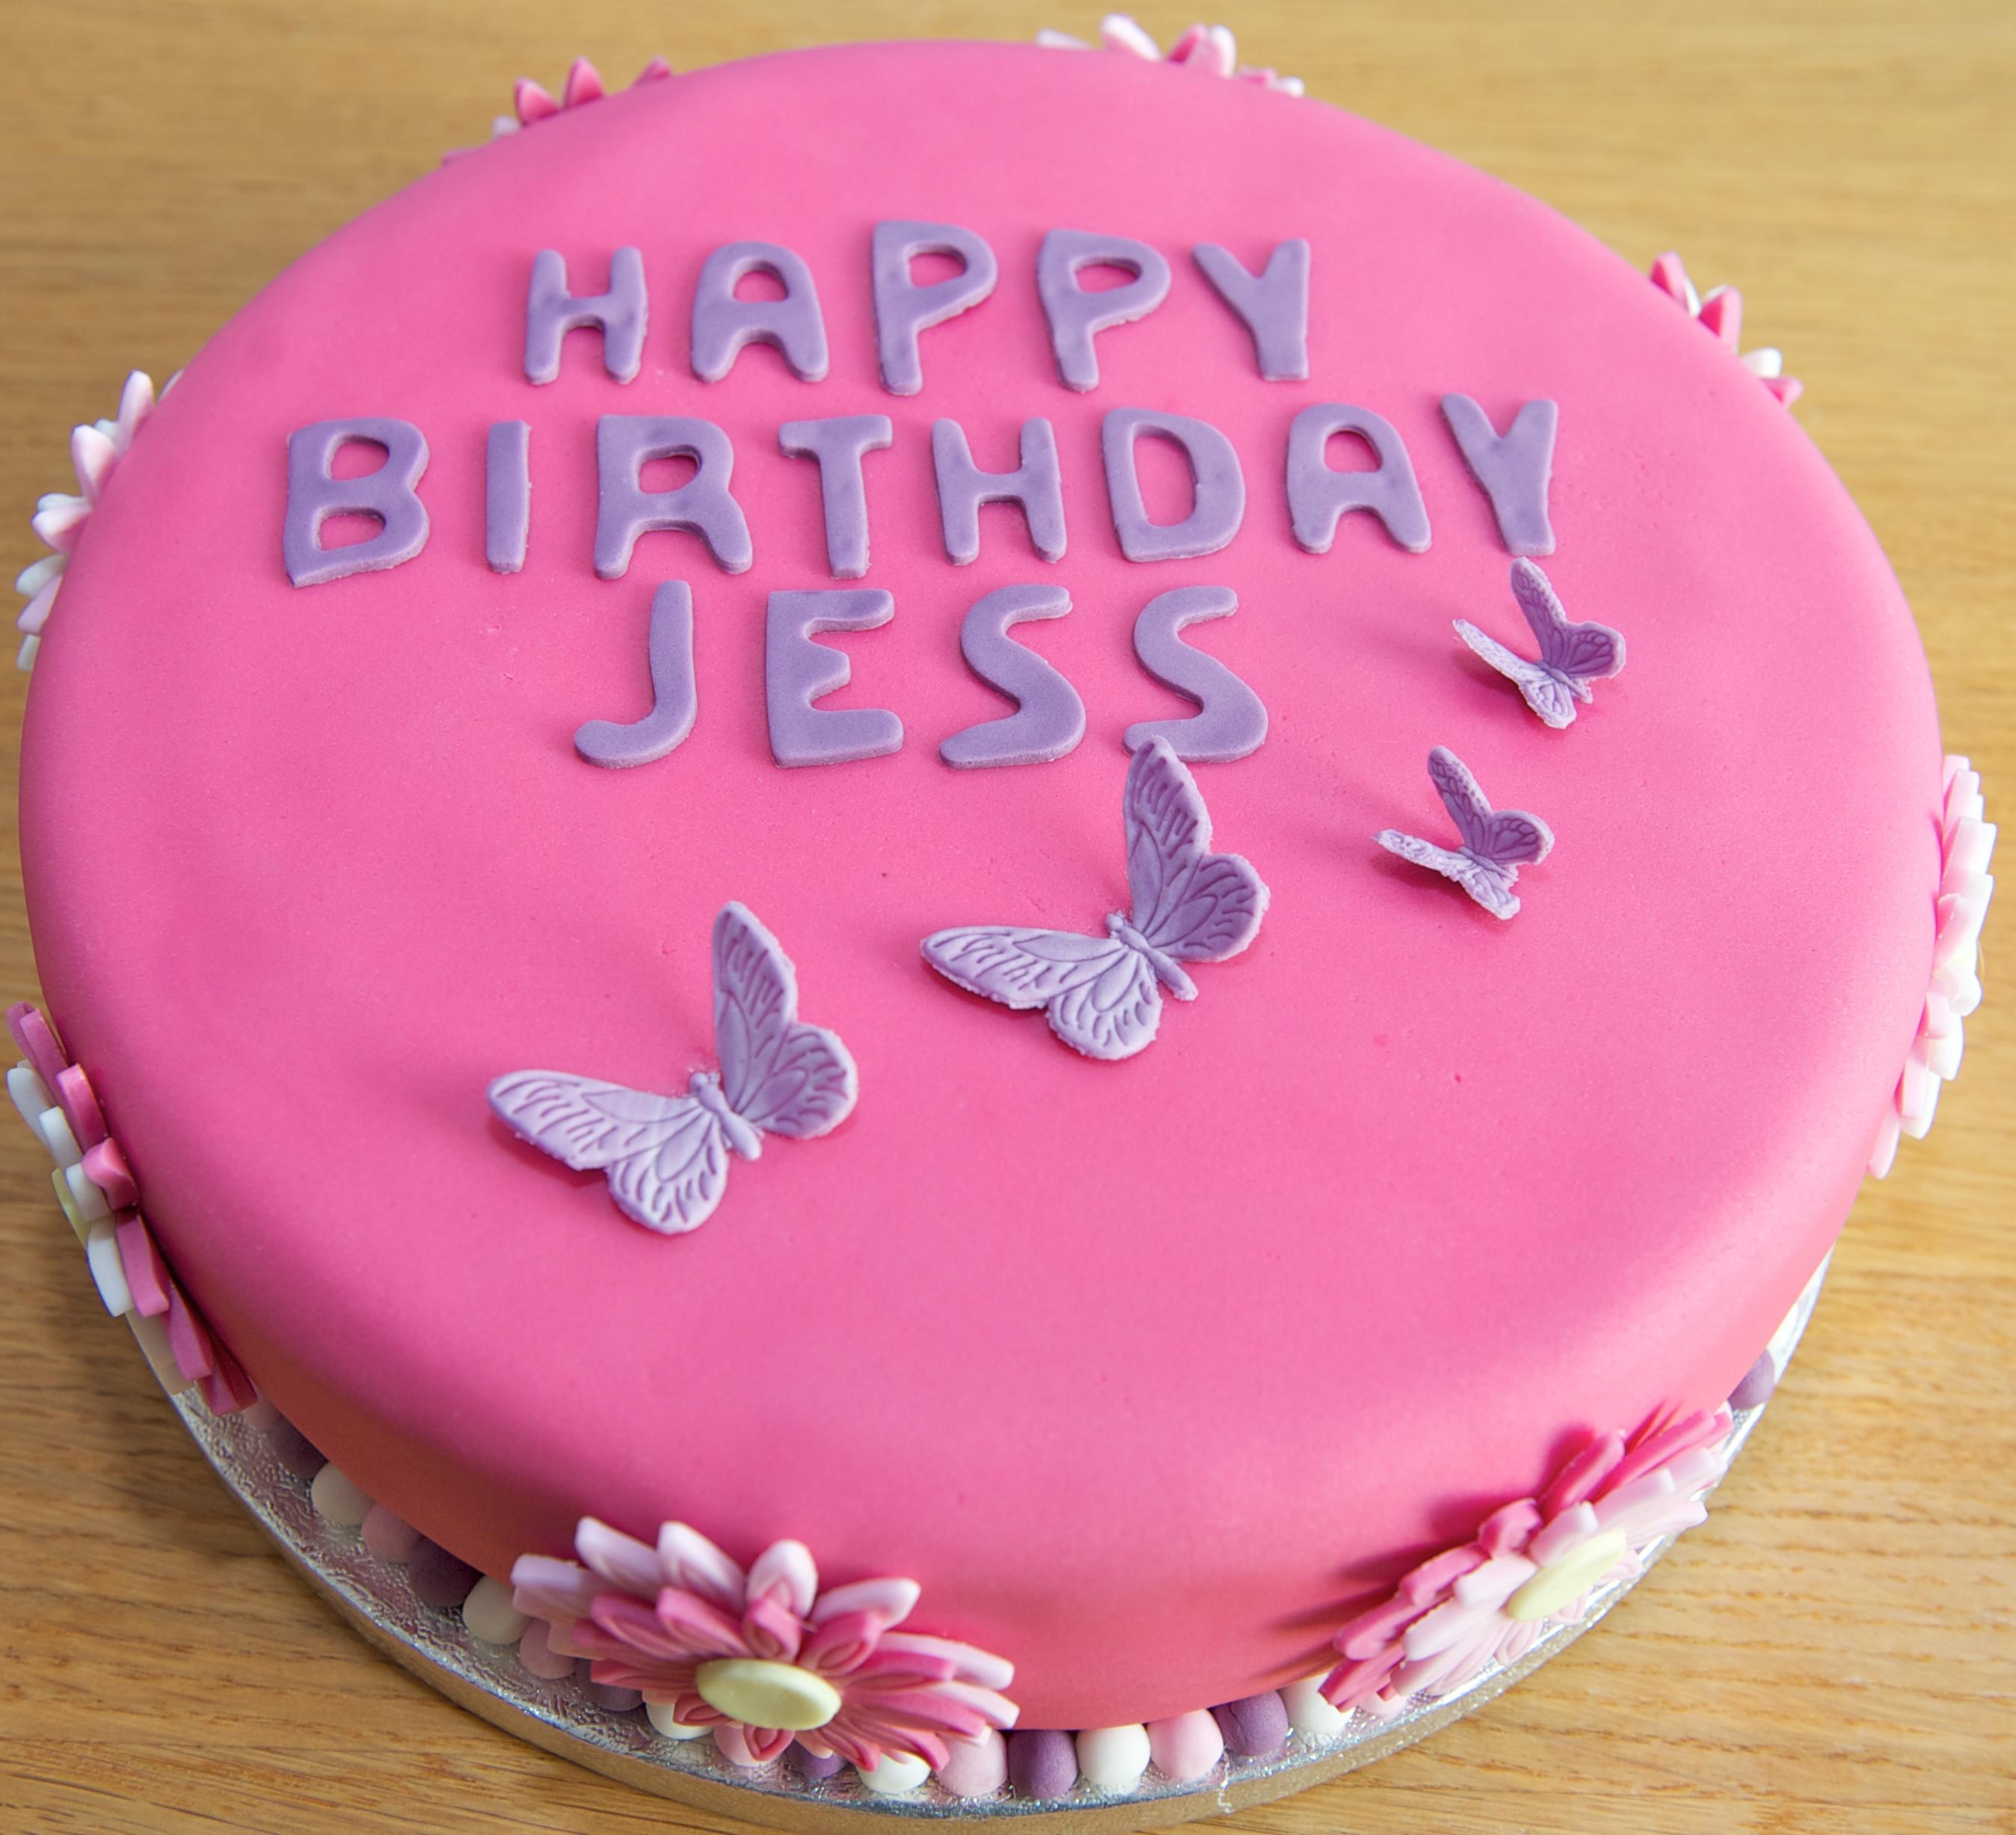 Super 10 Yessica Birthday Cakes Photo Happy Birthday Jessica Cake Funny Birthday Cards Online Inifodamsfinfo